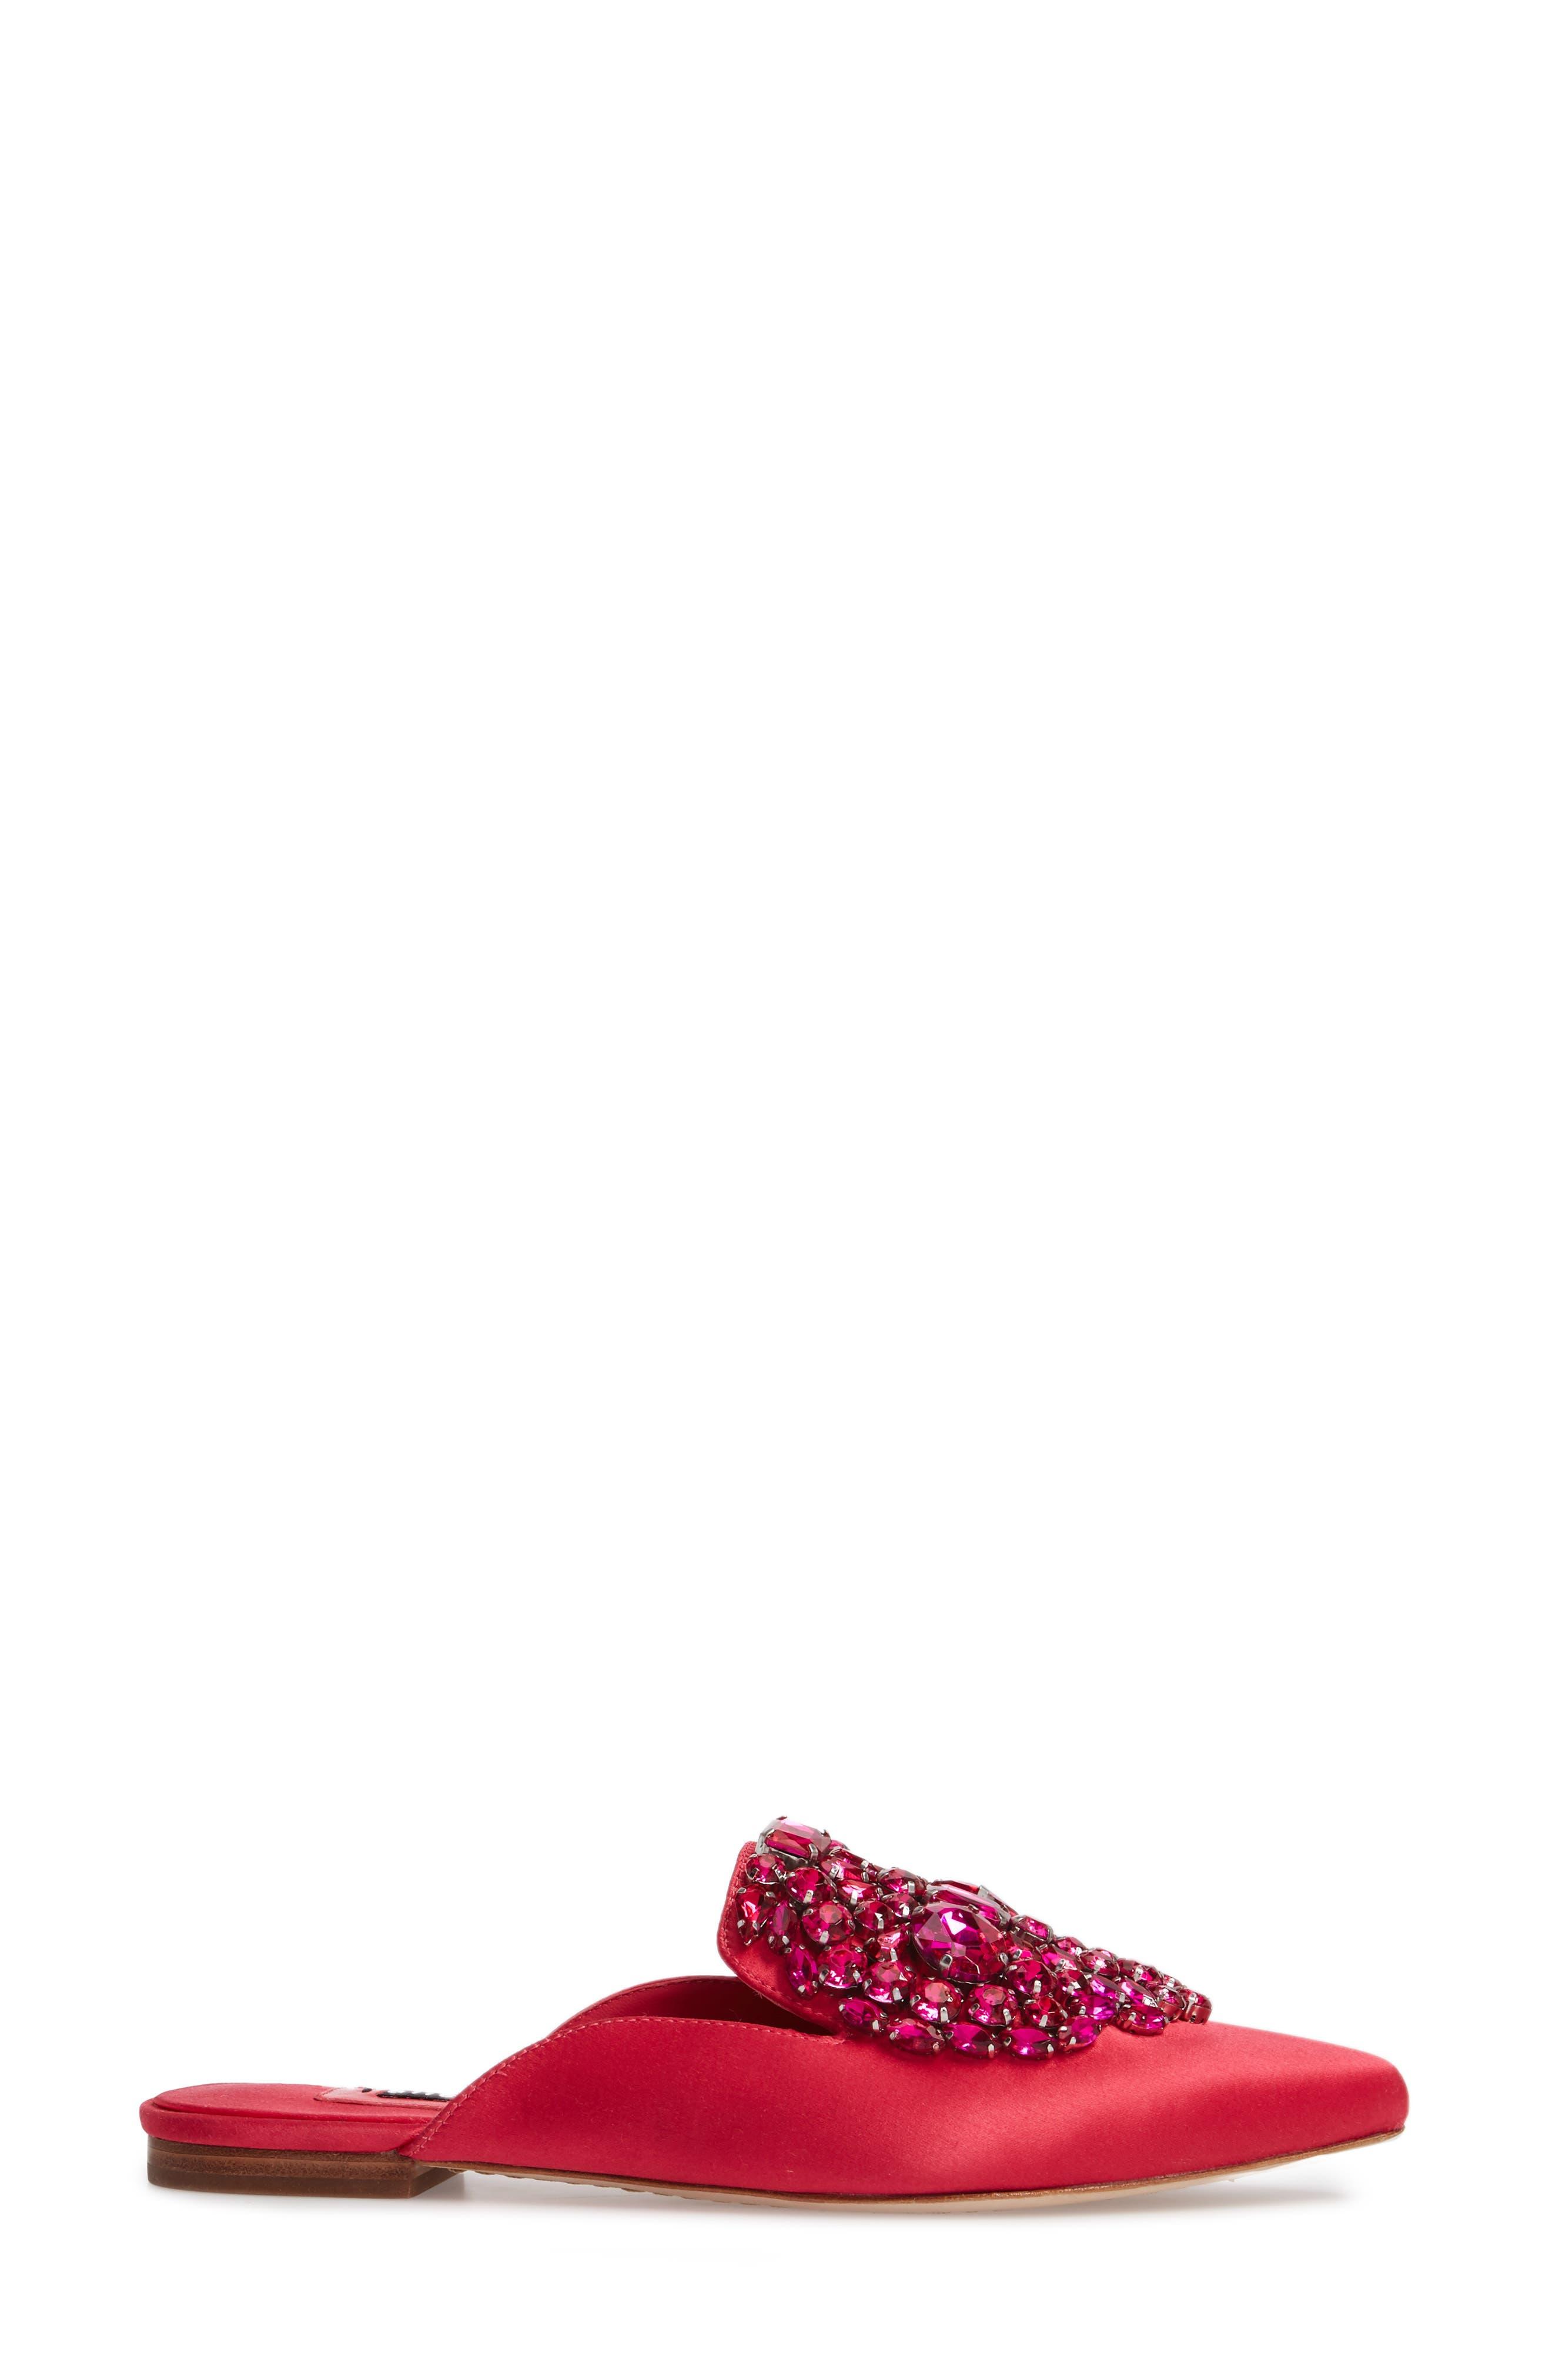 Lilly Crystal Embellished Loafer Mule,                             Alternate thumbnail 5, color,